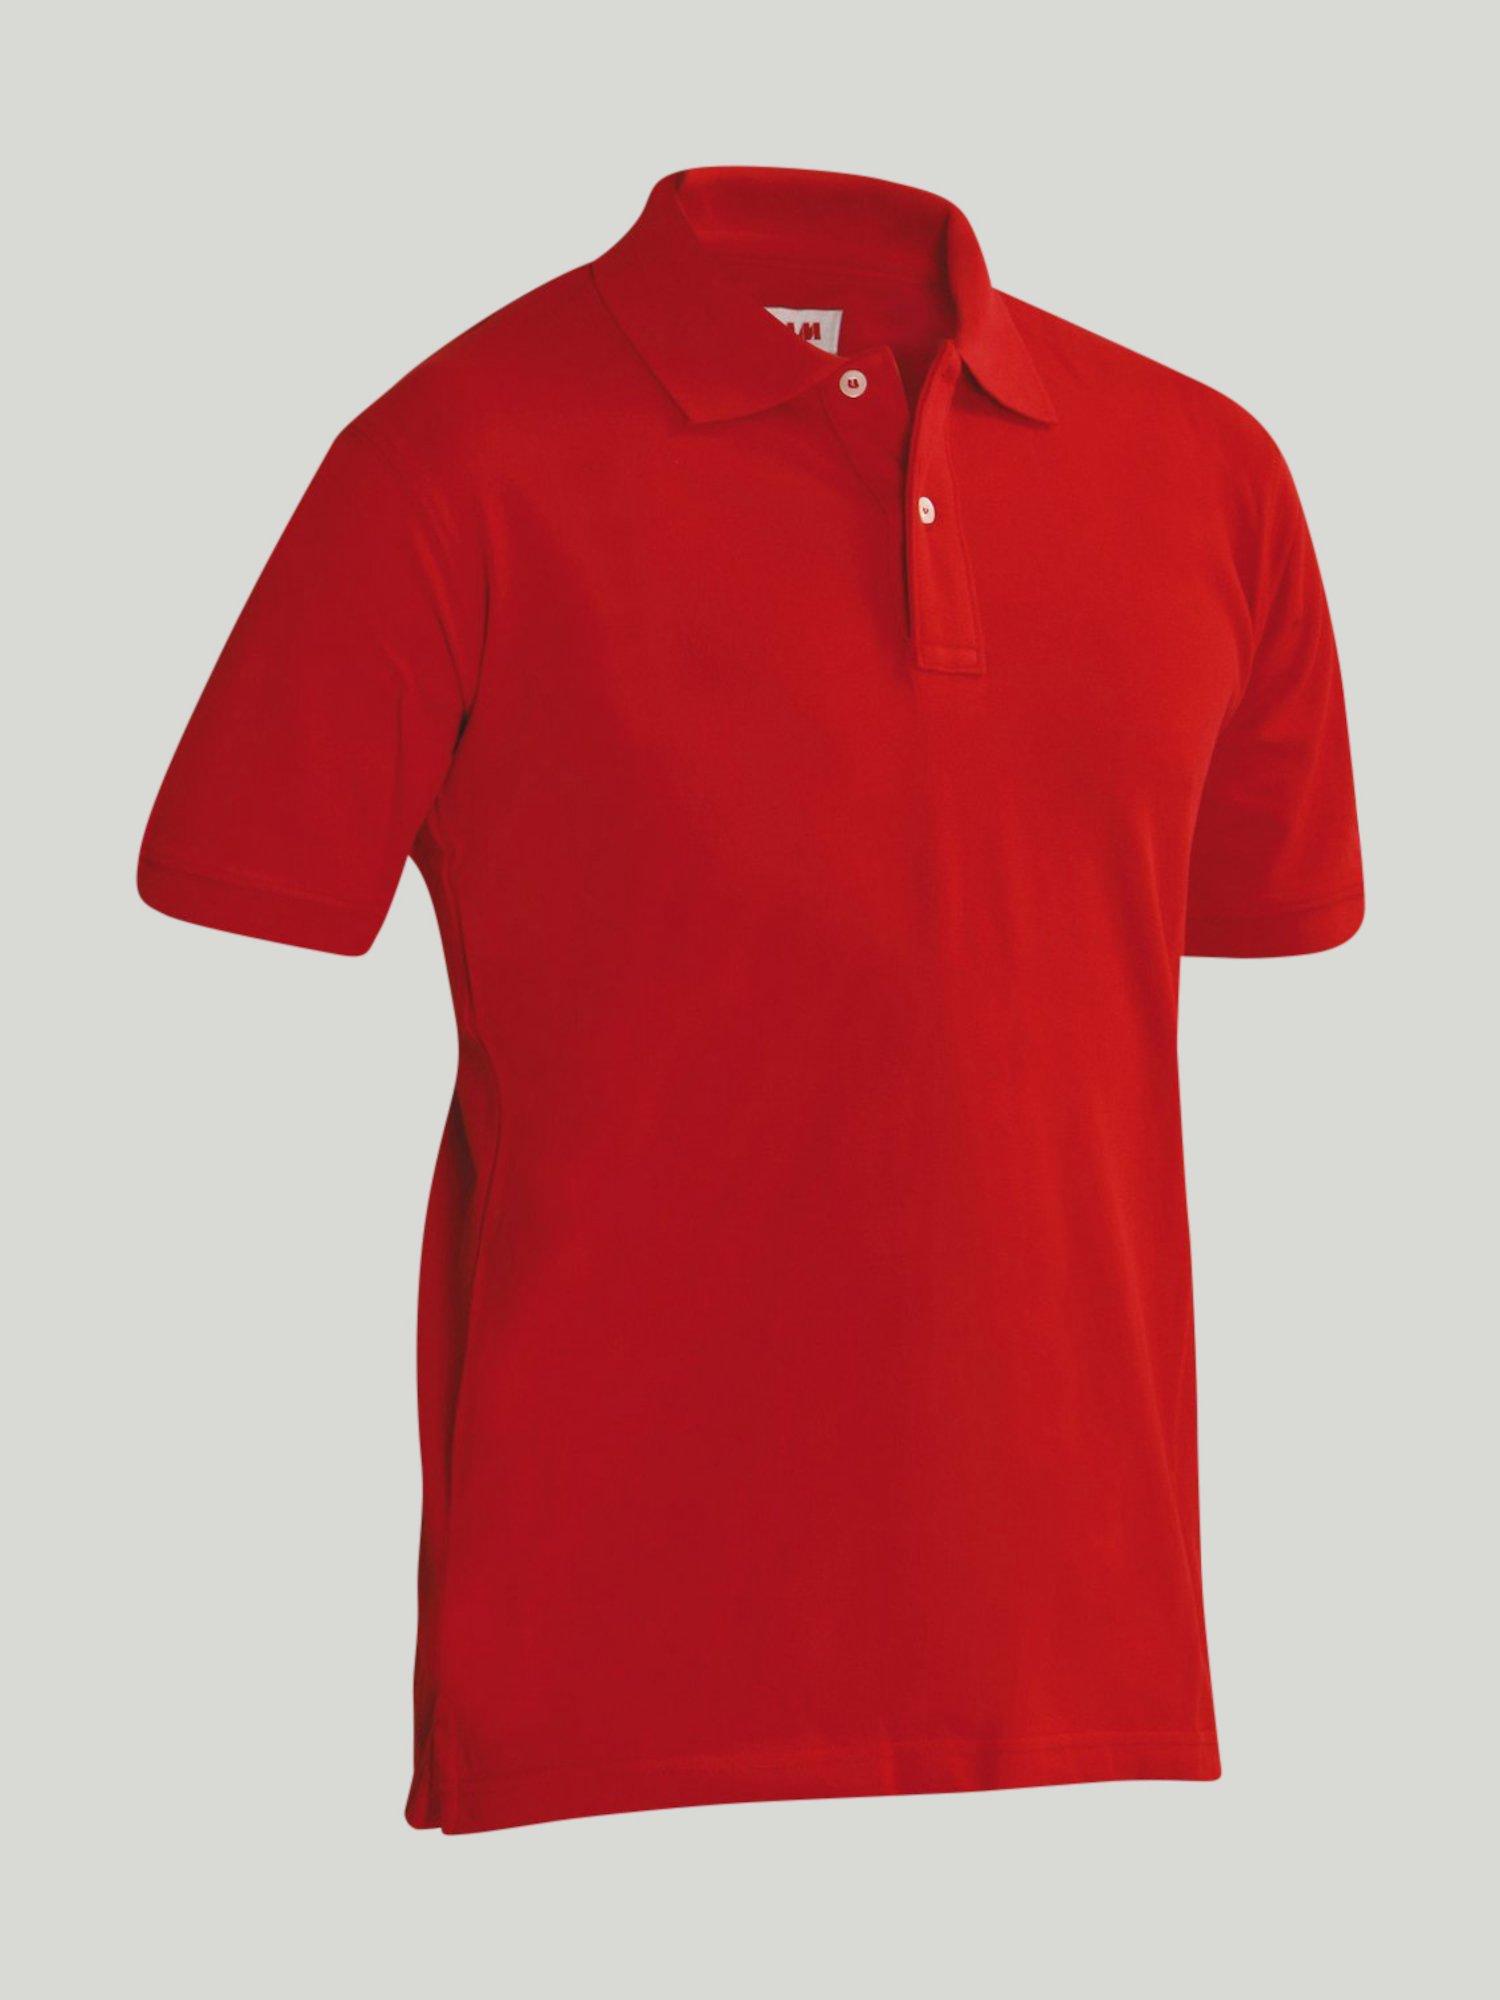 Coleman Ss New polo shirt